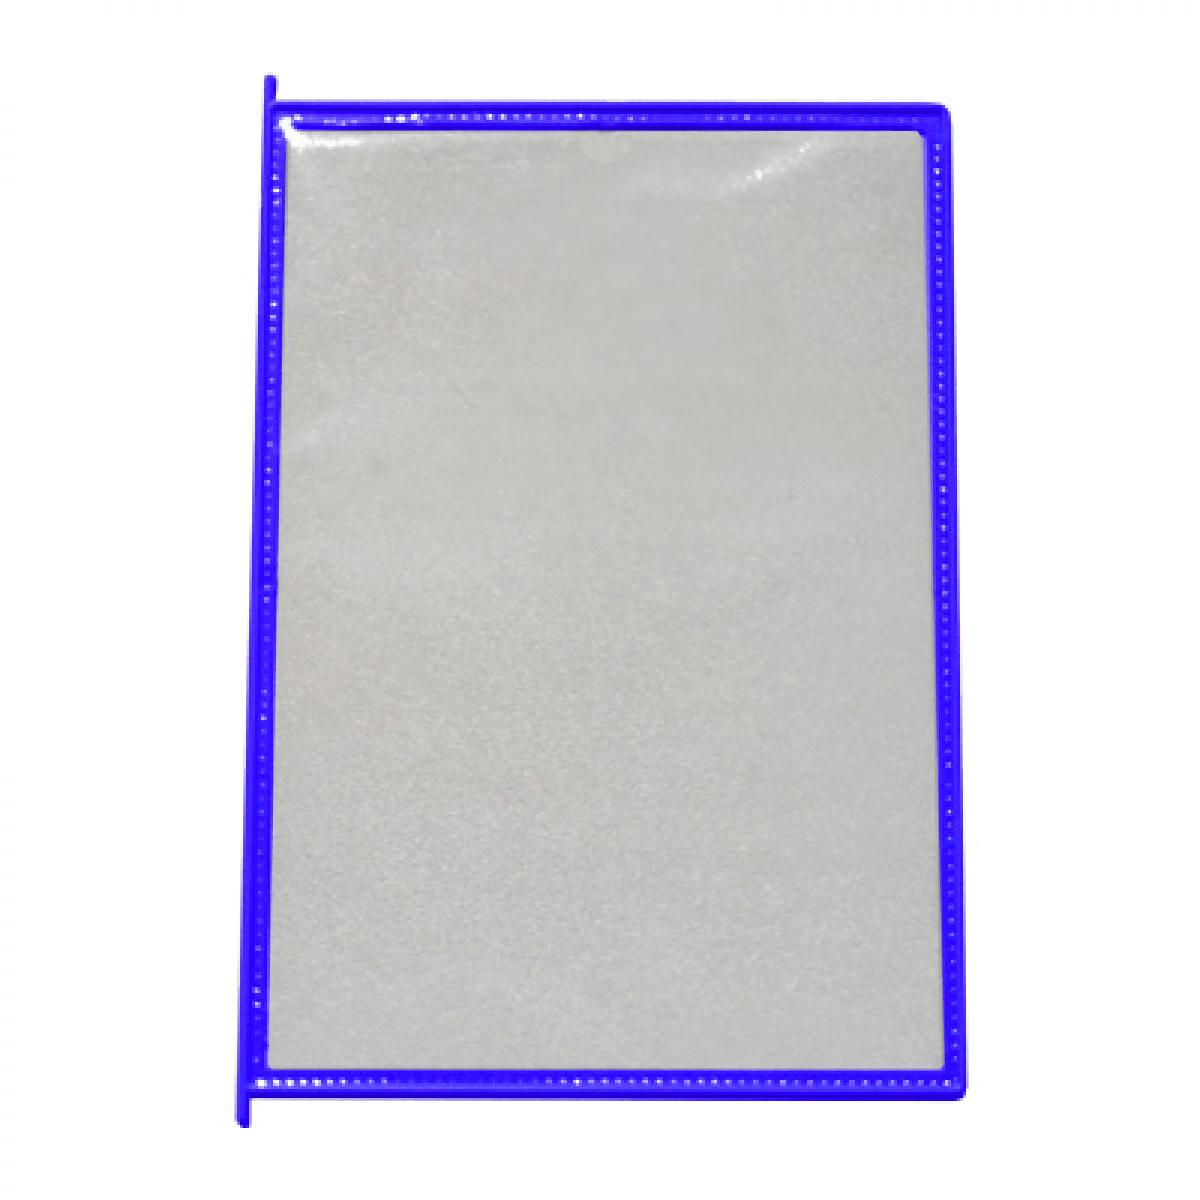 Карман для перекидной демо-системы цвет: синий